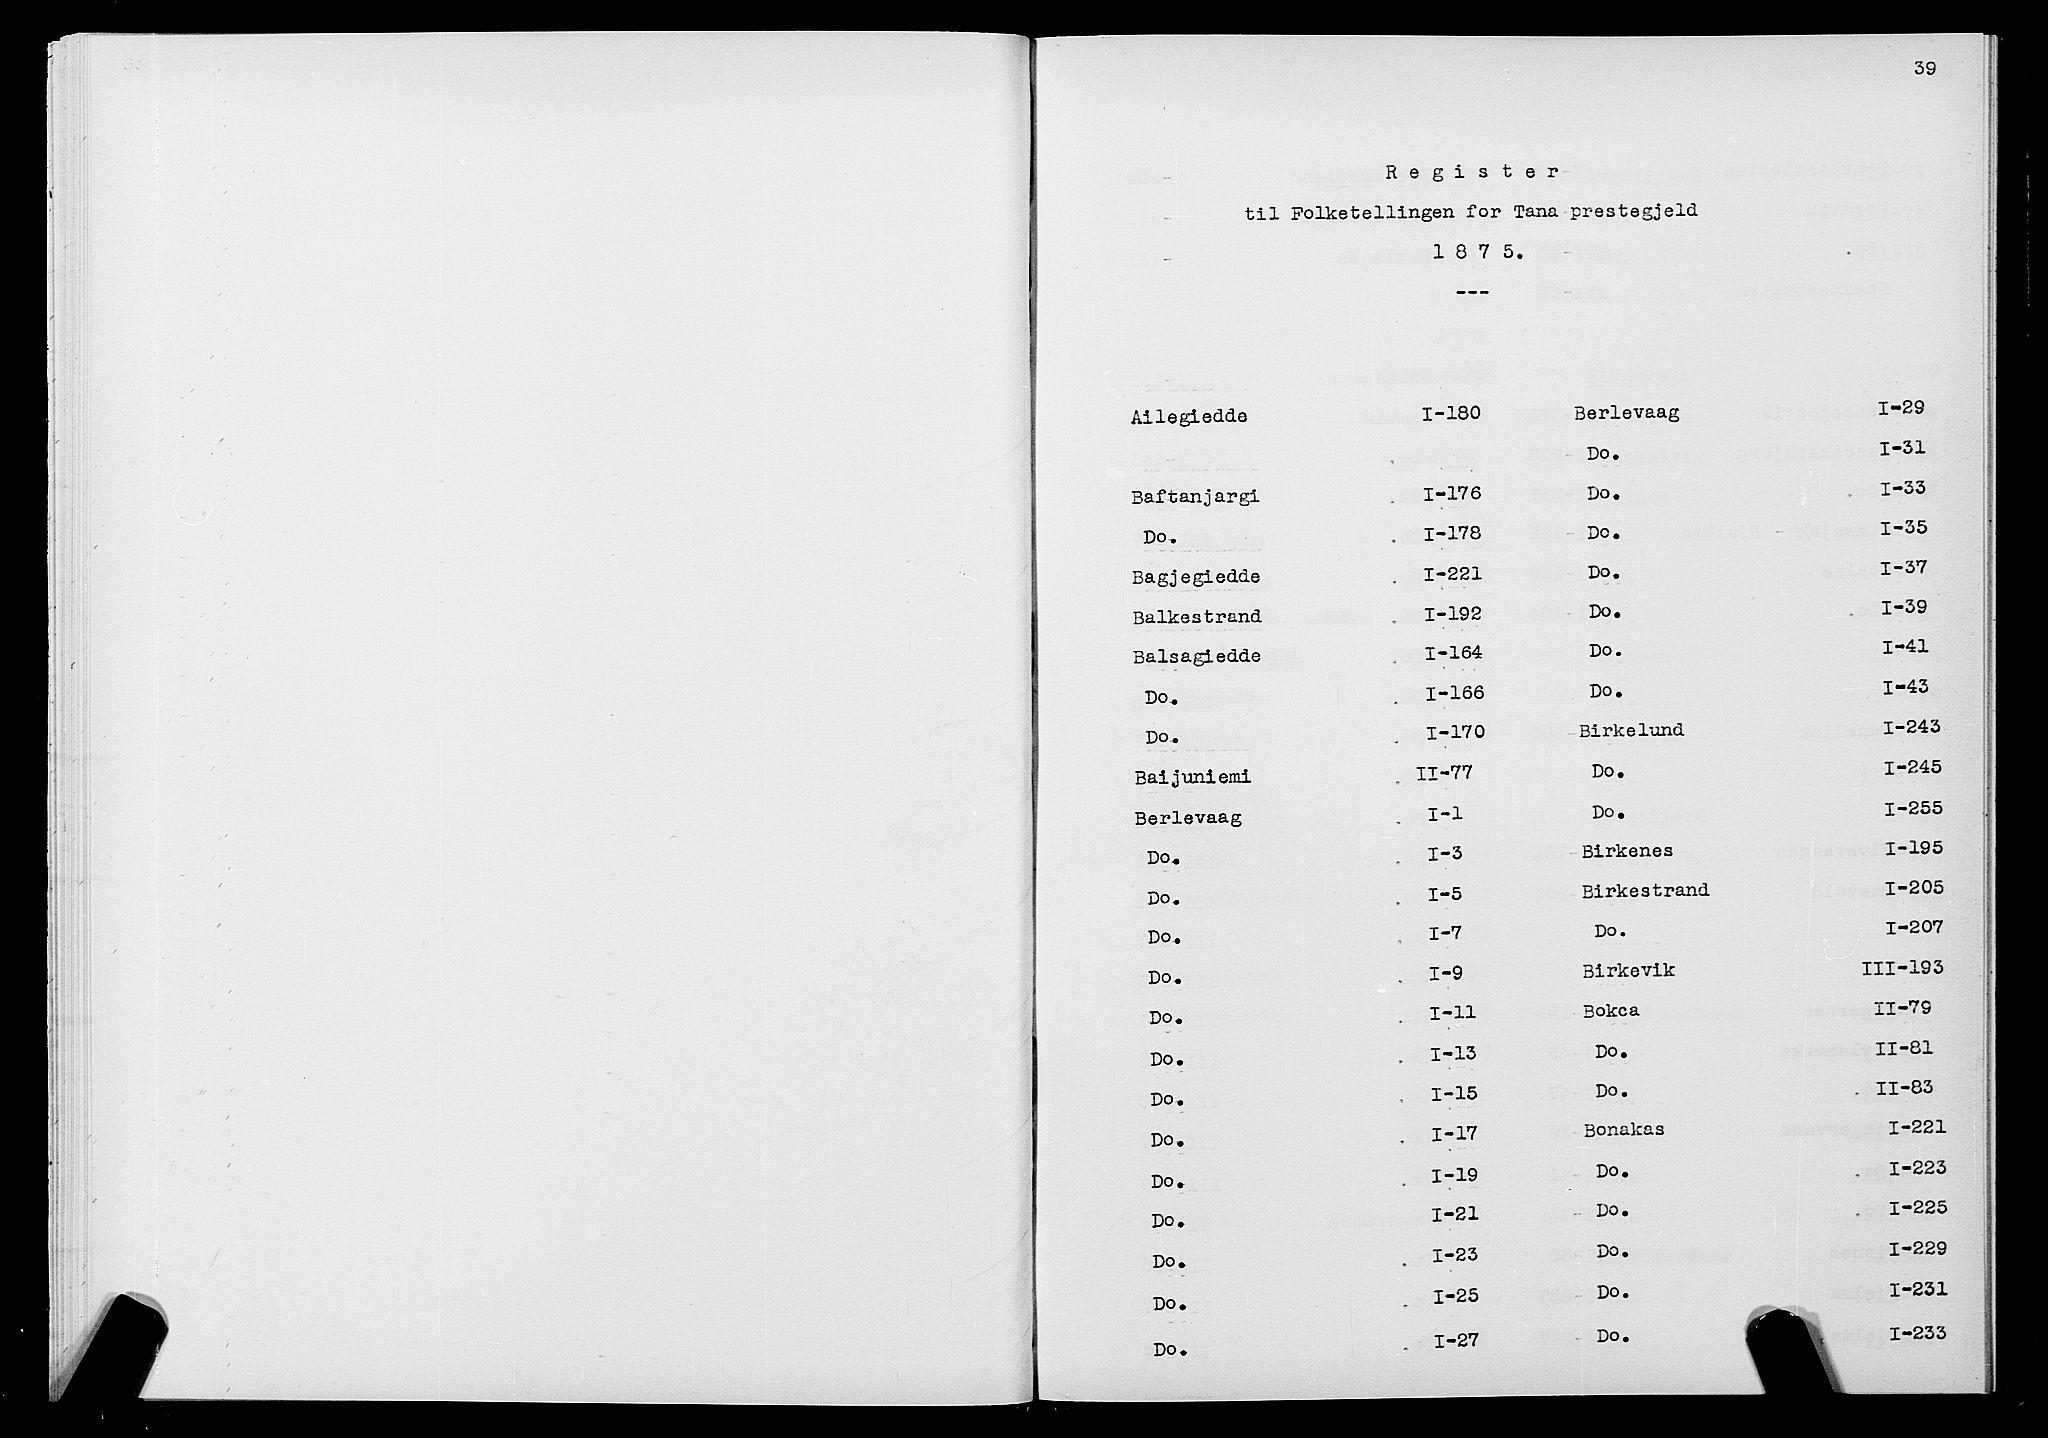 SATØ, Folketelling 1875 for 2025P Tana prestegjeld, 1875, s. 39